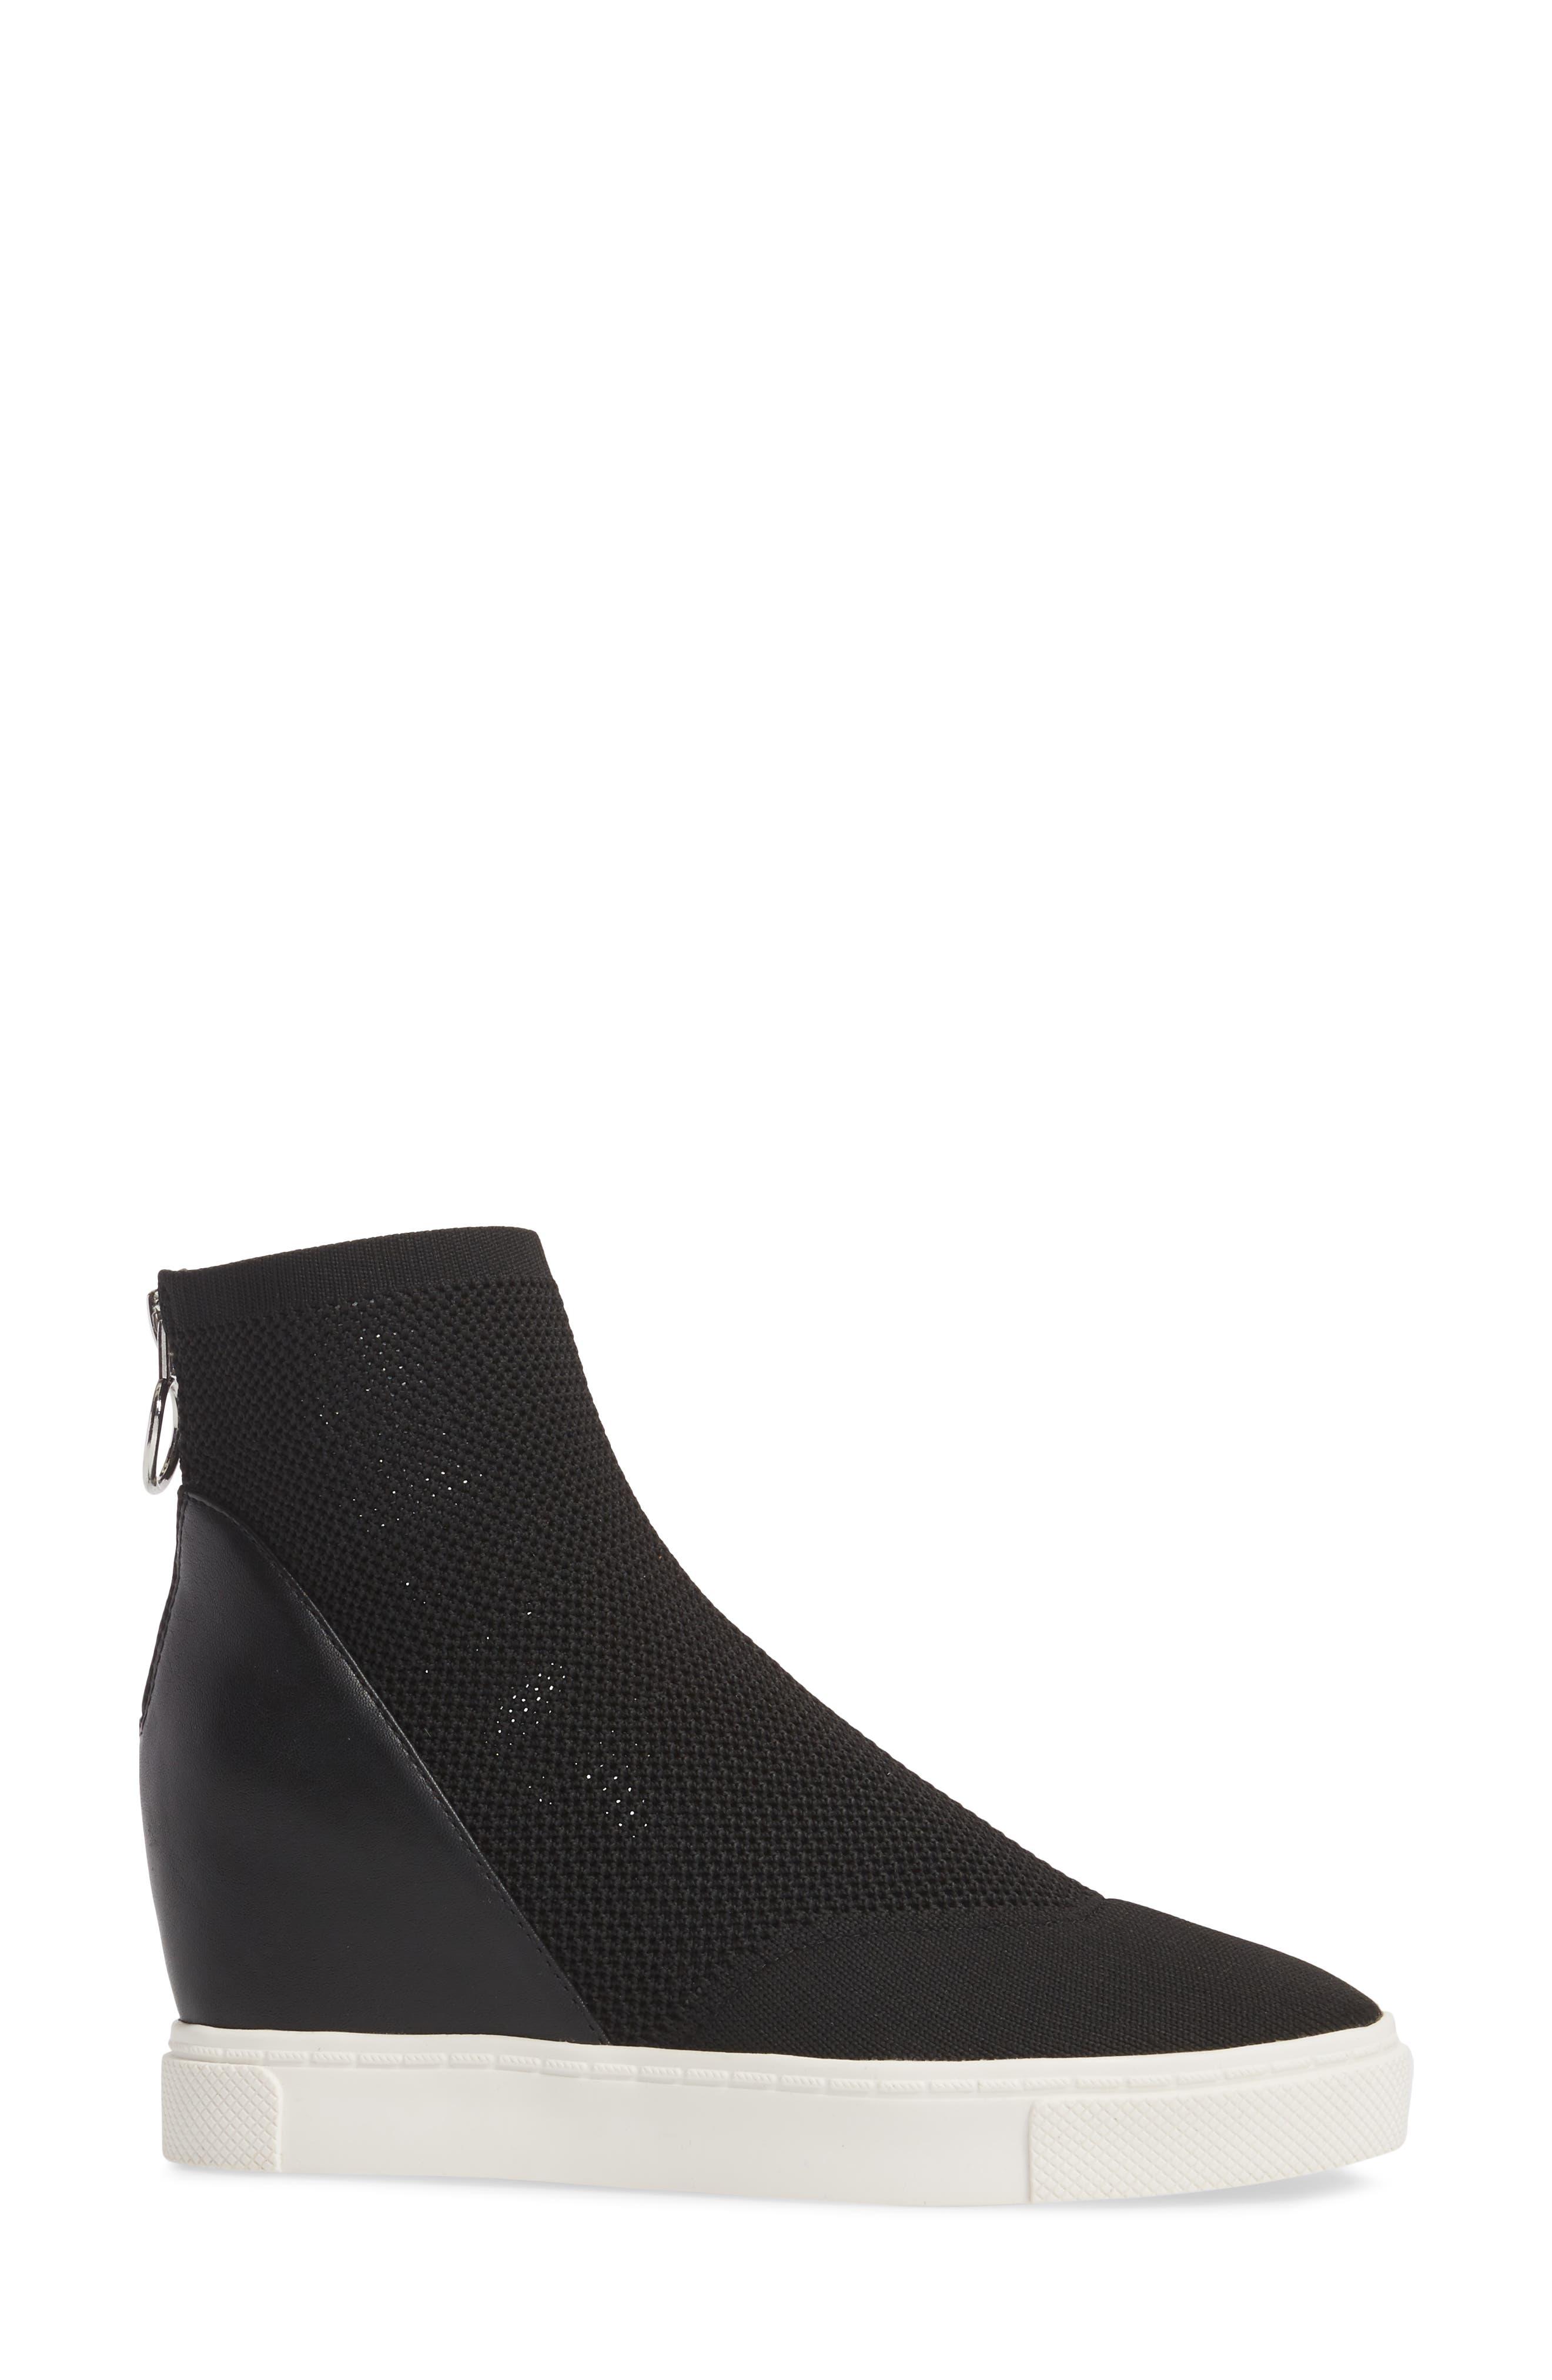 Lizzy Sneaker Bootie,                             Alternate thumbnail 3, color,                             Black